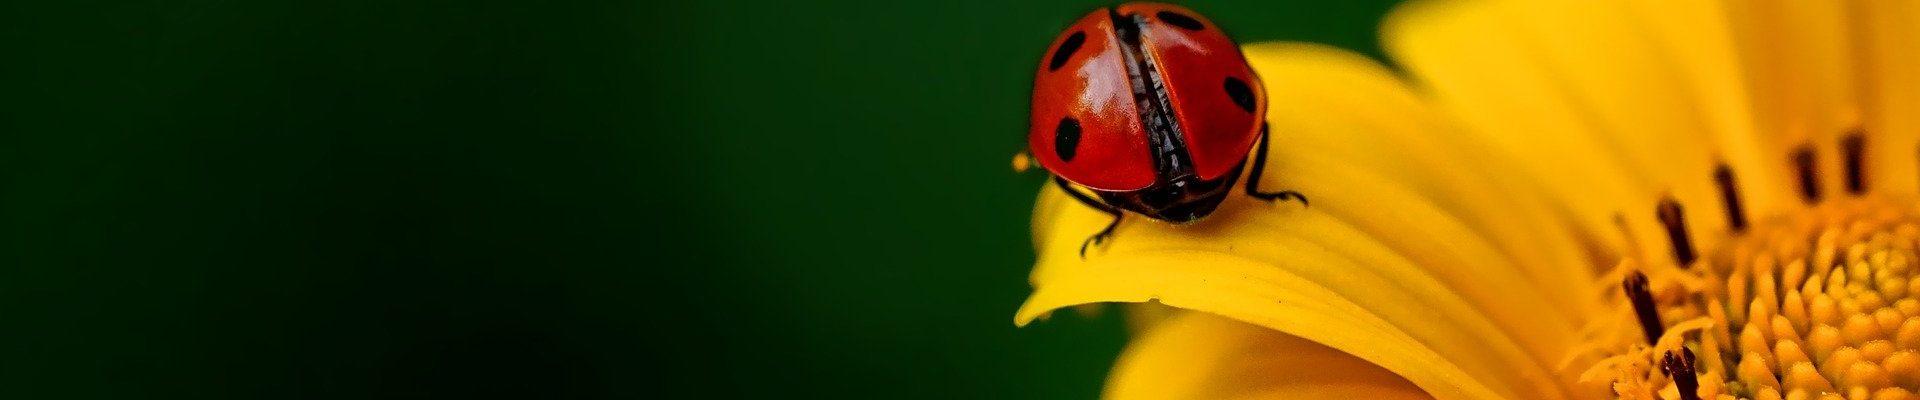 ladybug-3475779_1920